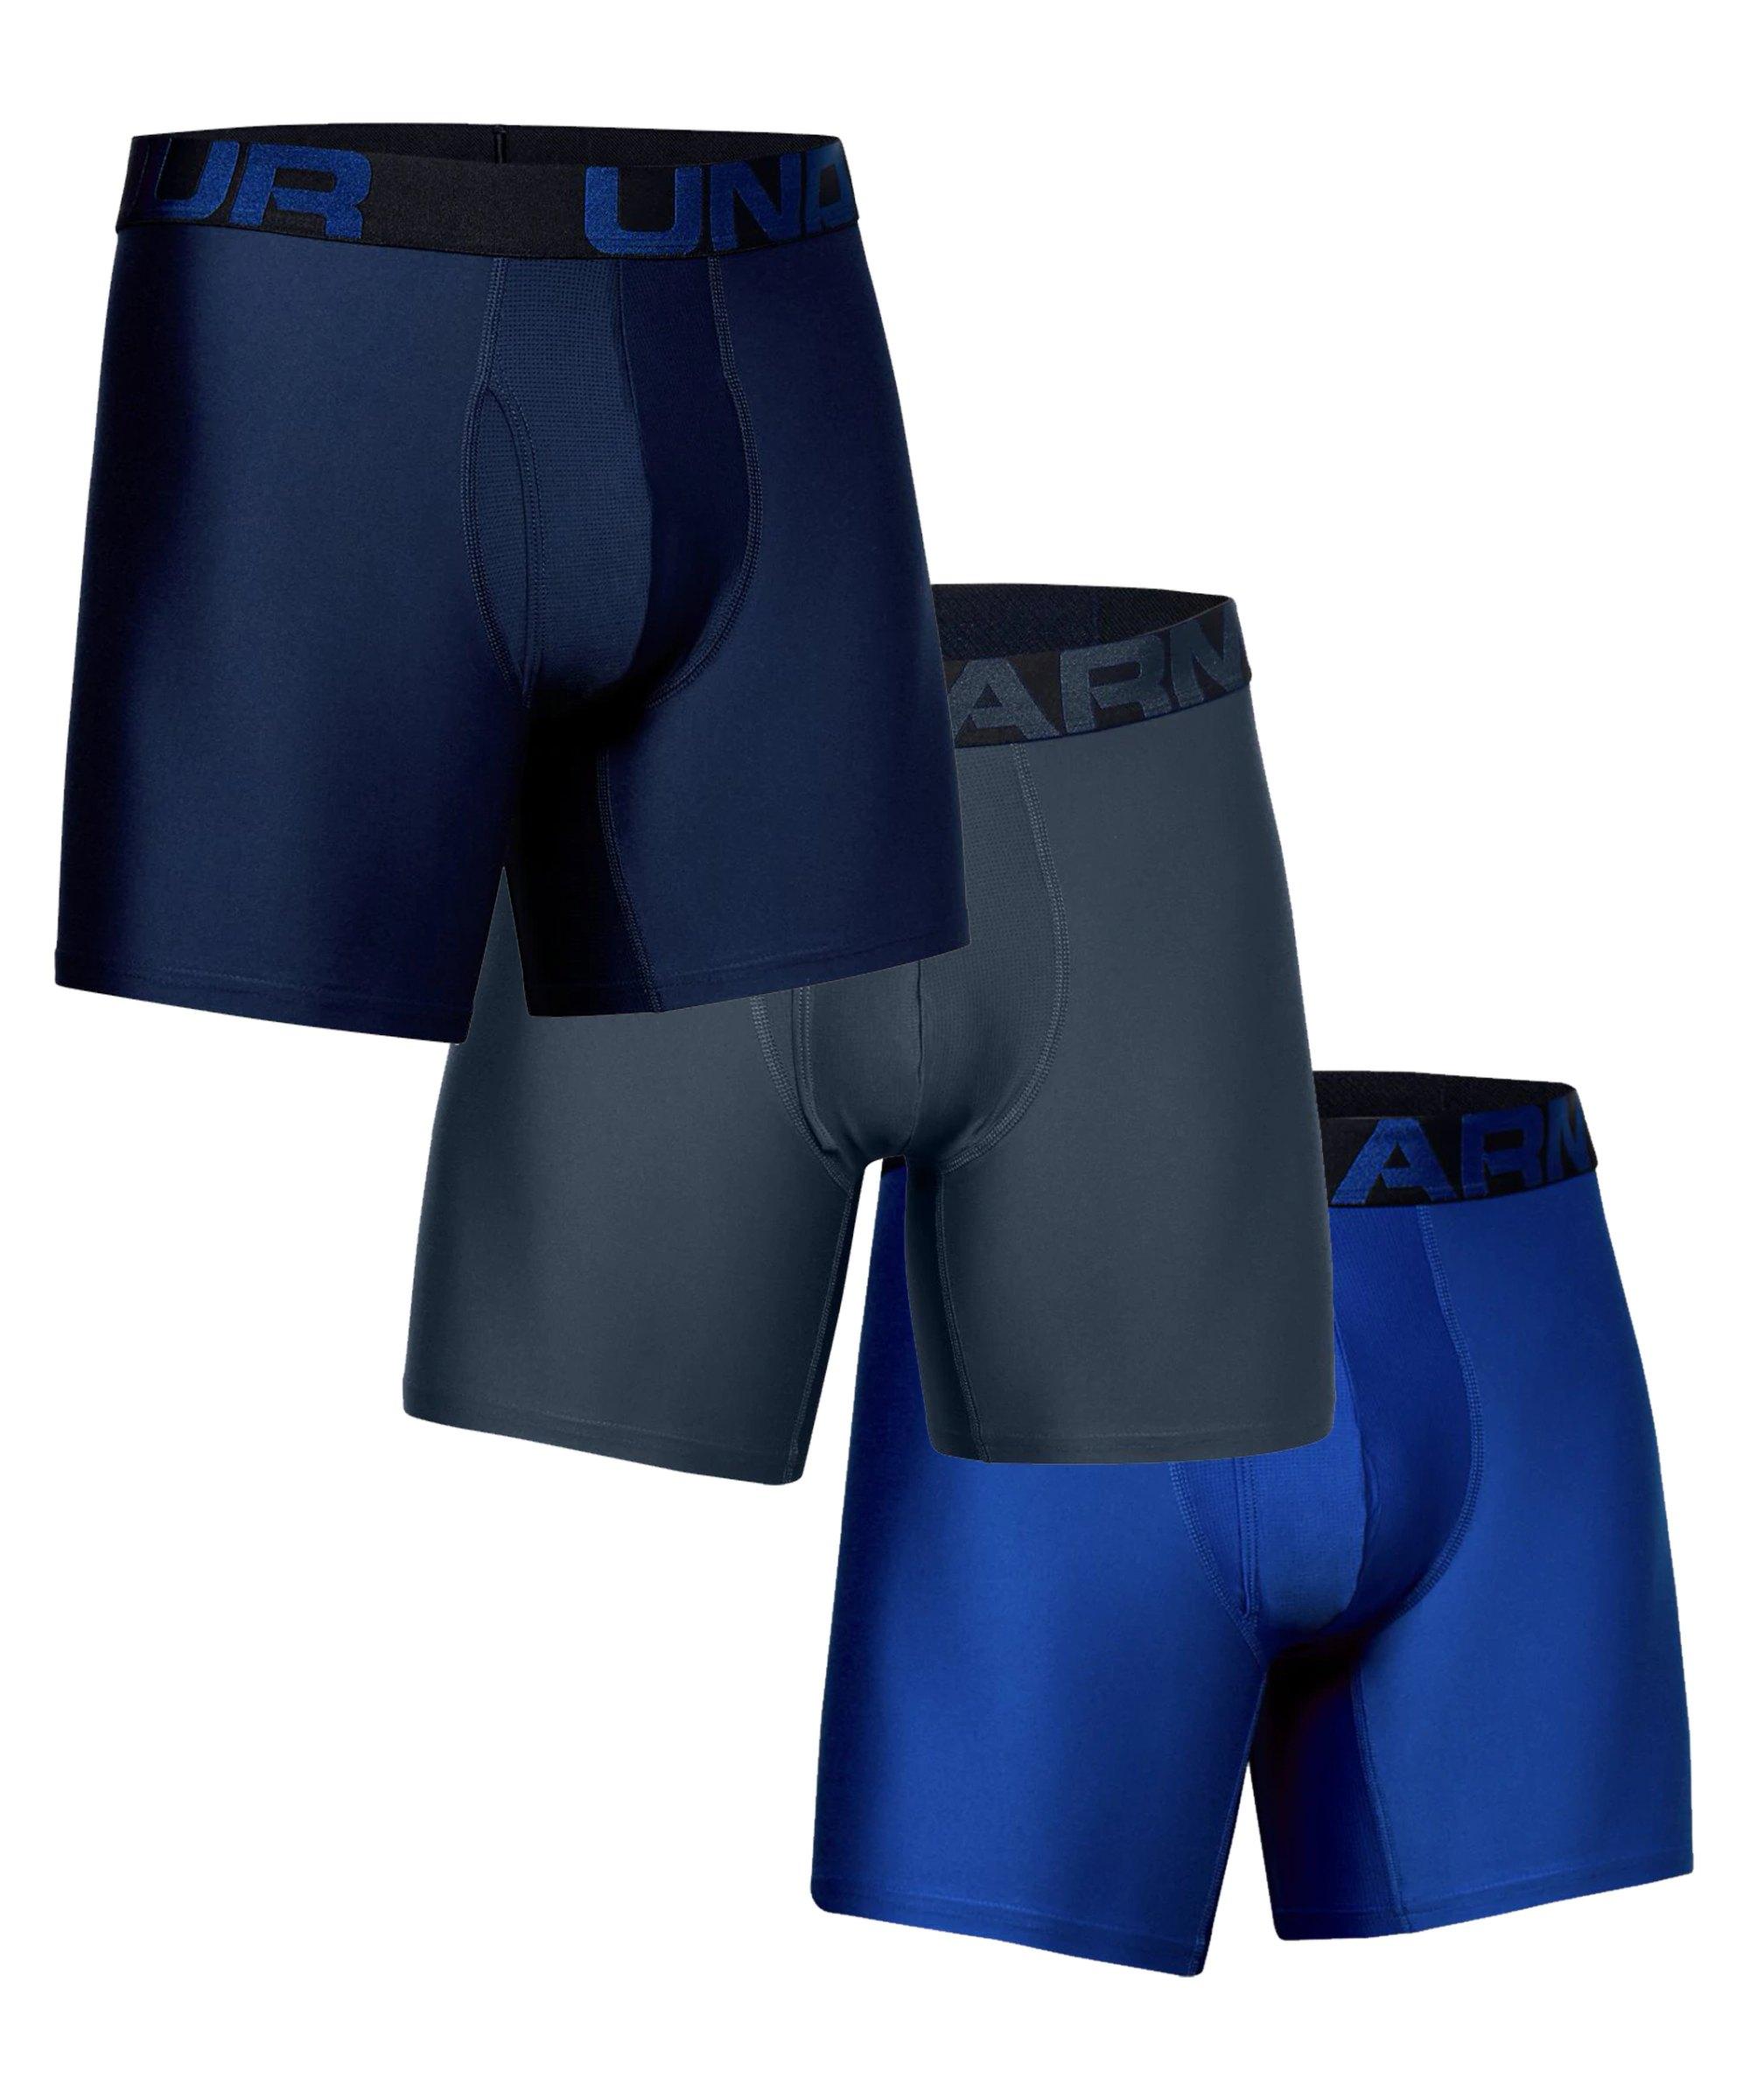 Under Armour Tech 6in Boxer Short 3er Pack F408 - blau